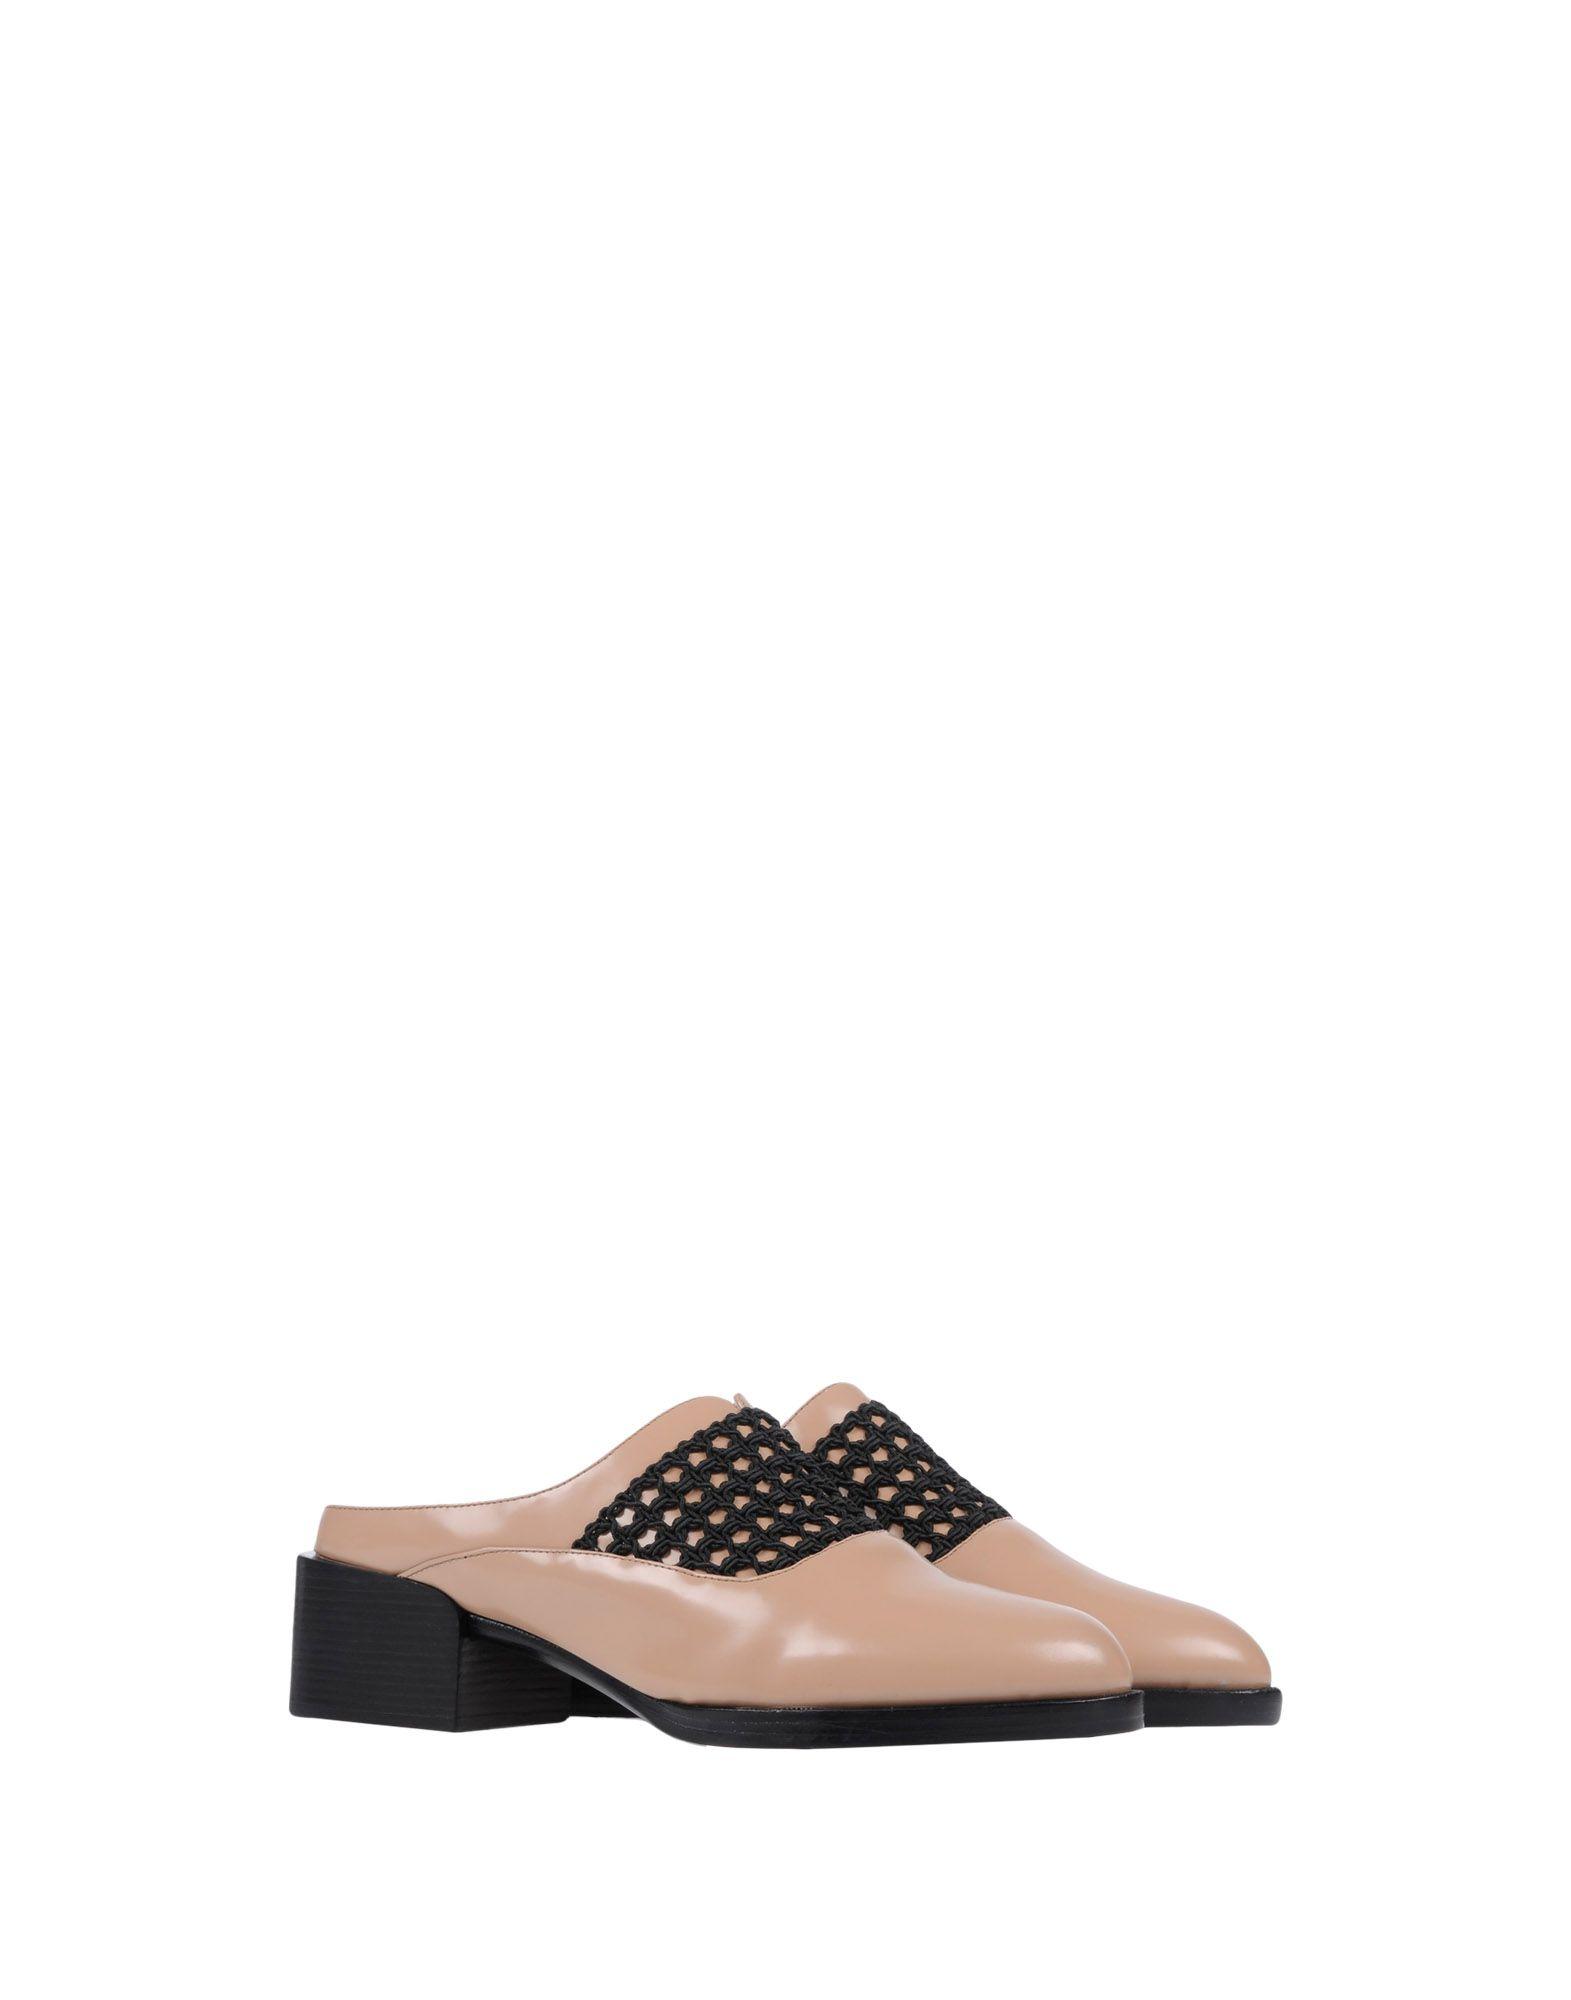 Rabatt Schuhe 3.1 Phillip 11457745SN Lim Pantoletten Damen  11457745SN Phillip fdc112